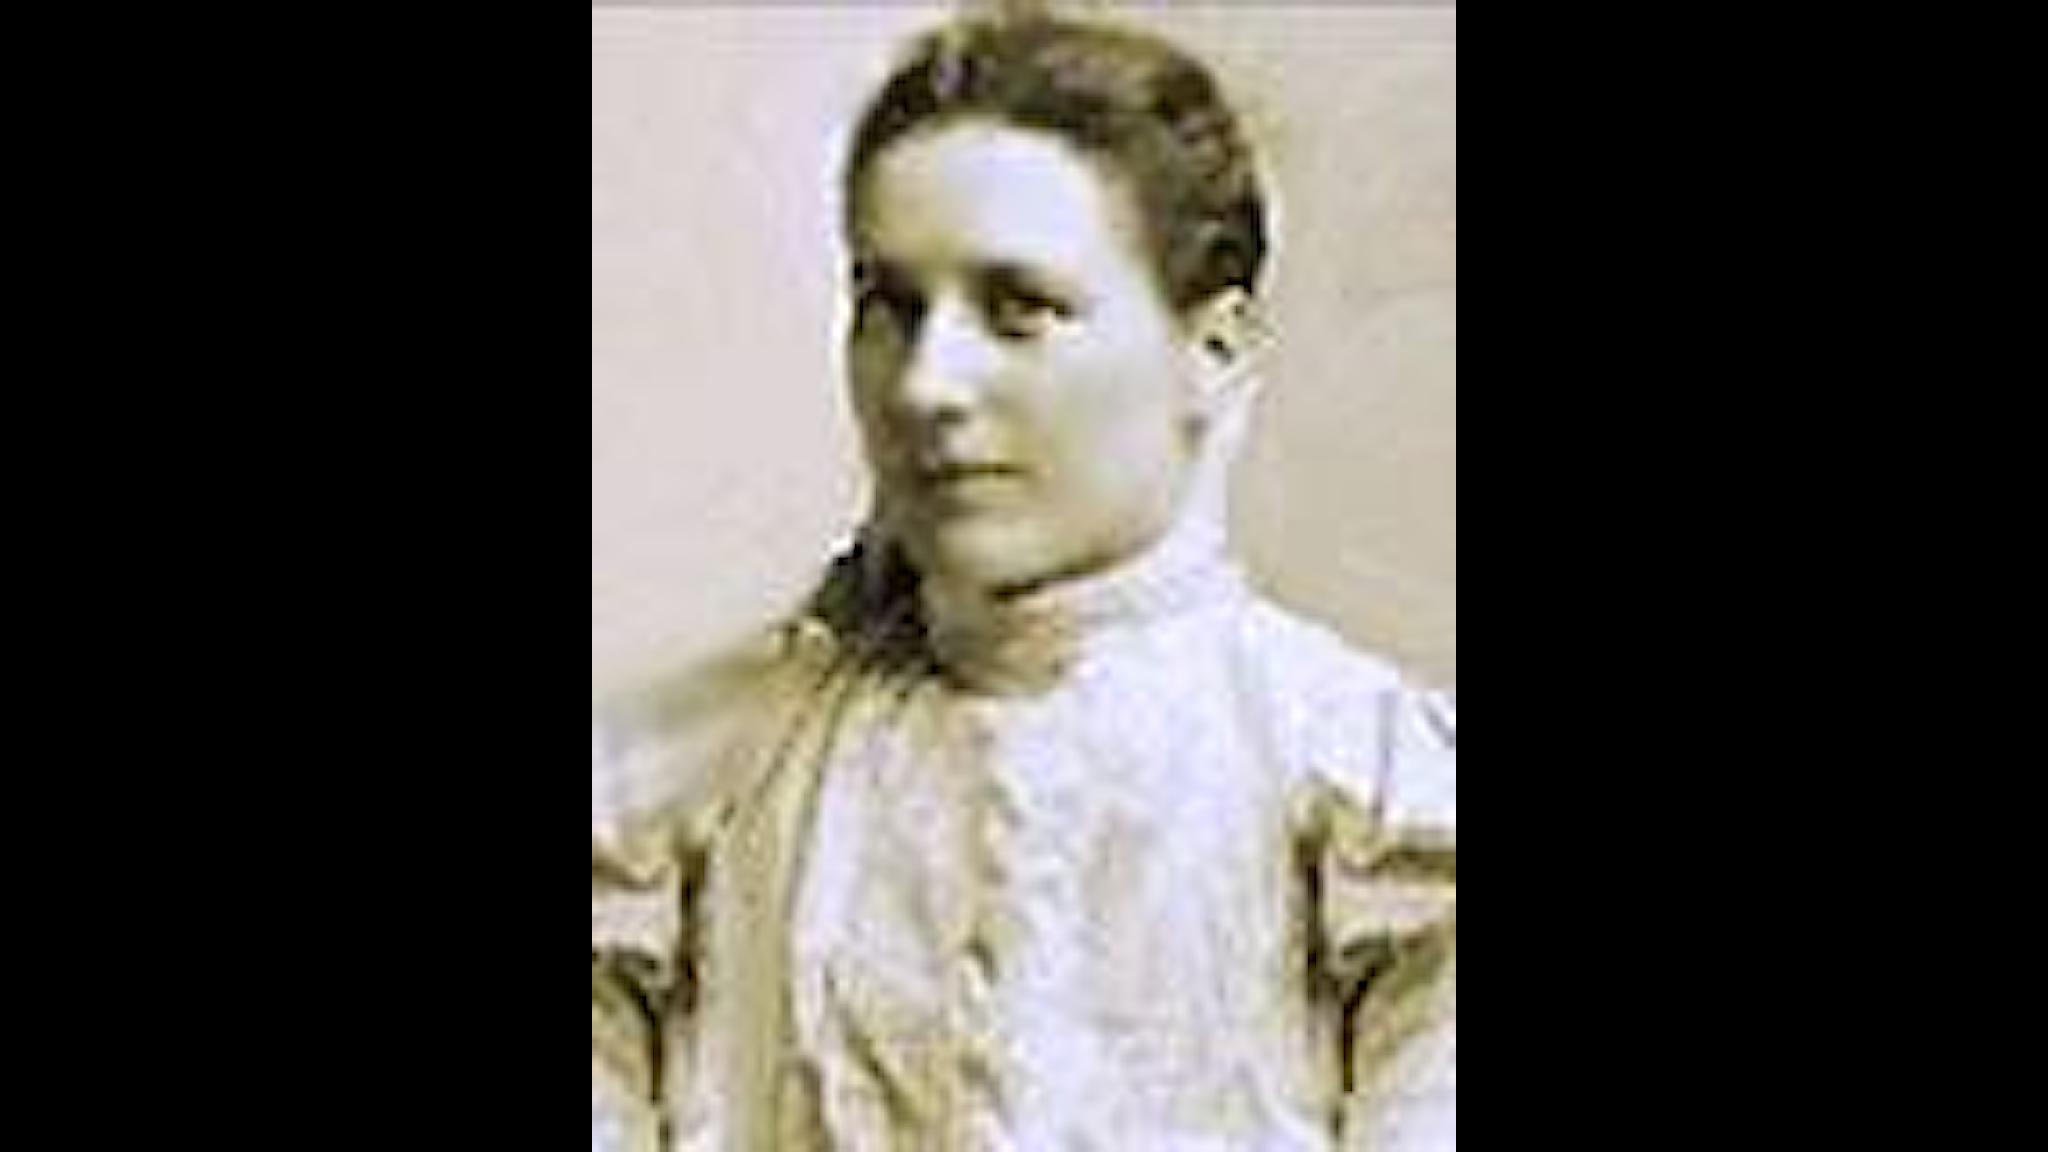 Alice Tegnér - Bild från Historiesajten.se